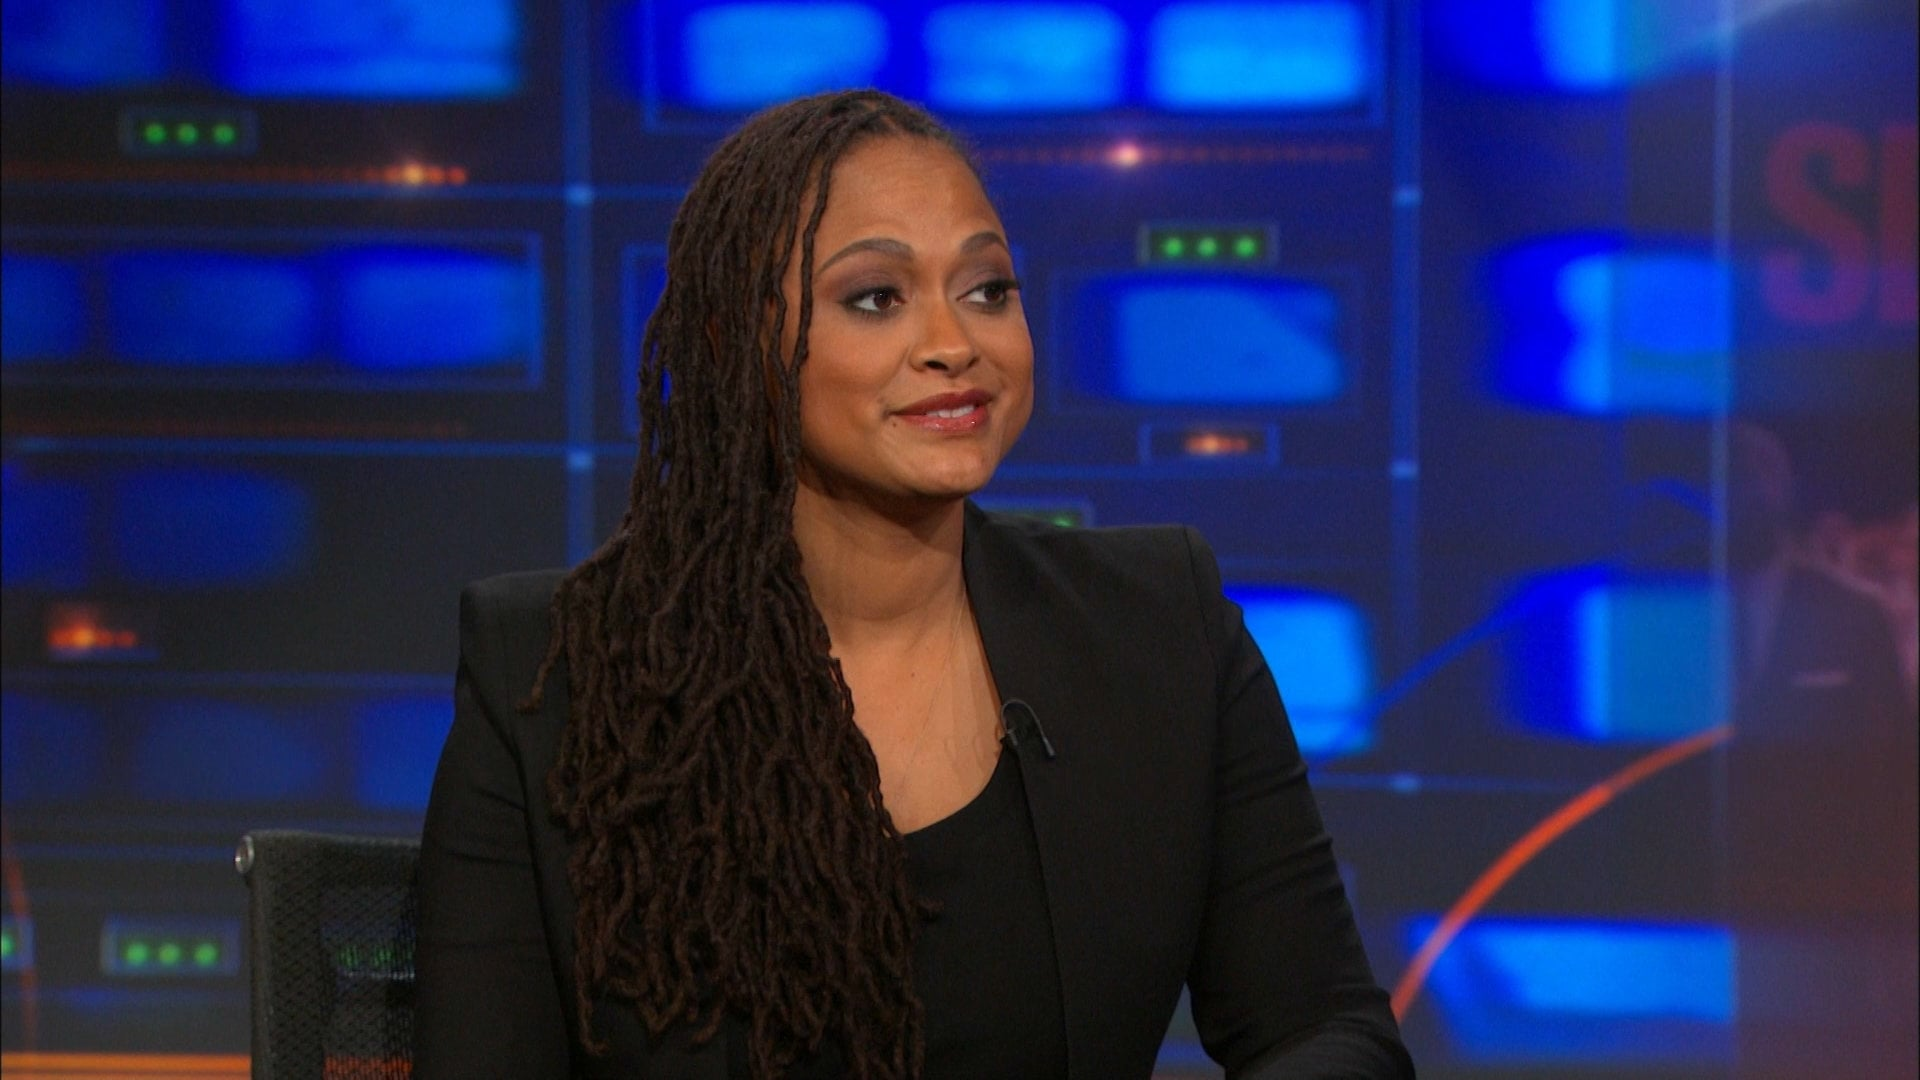 The Daily Show with Trevor Noah Season 20 :Episode 43  Ava DuVernay